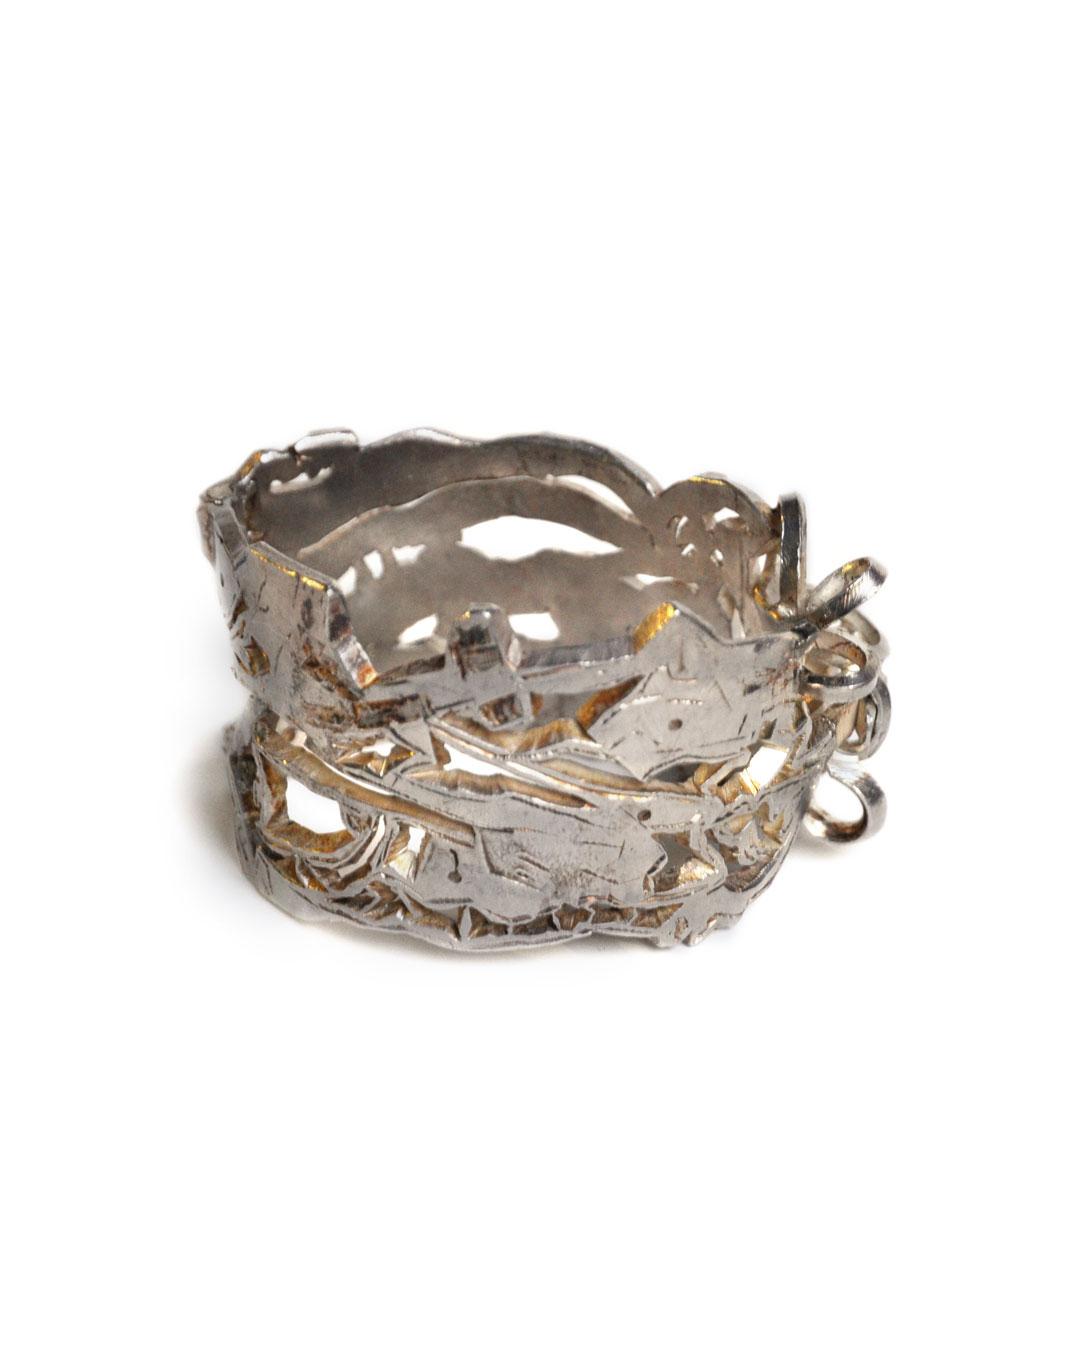 Rudolf Kocéa, Stier (Bull), 2008, bracelet; silver, ø 70 x 40 mm, €2750